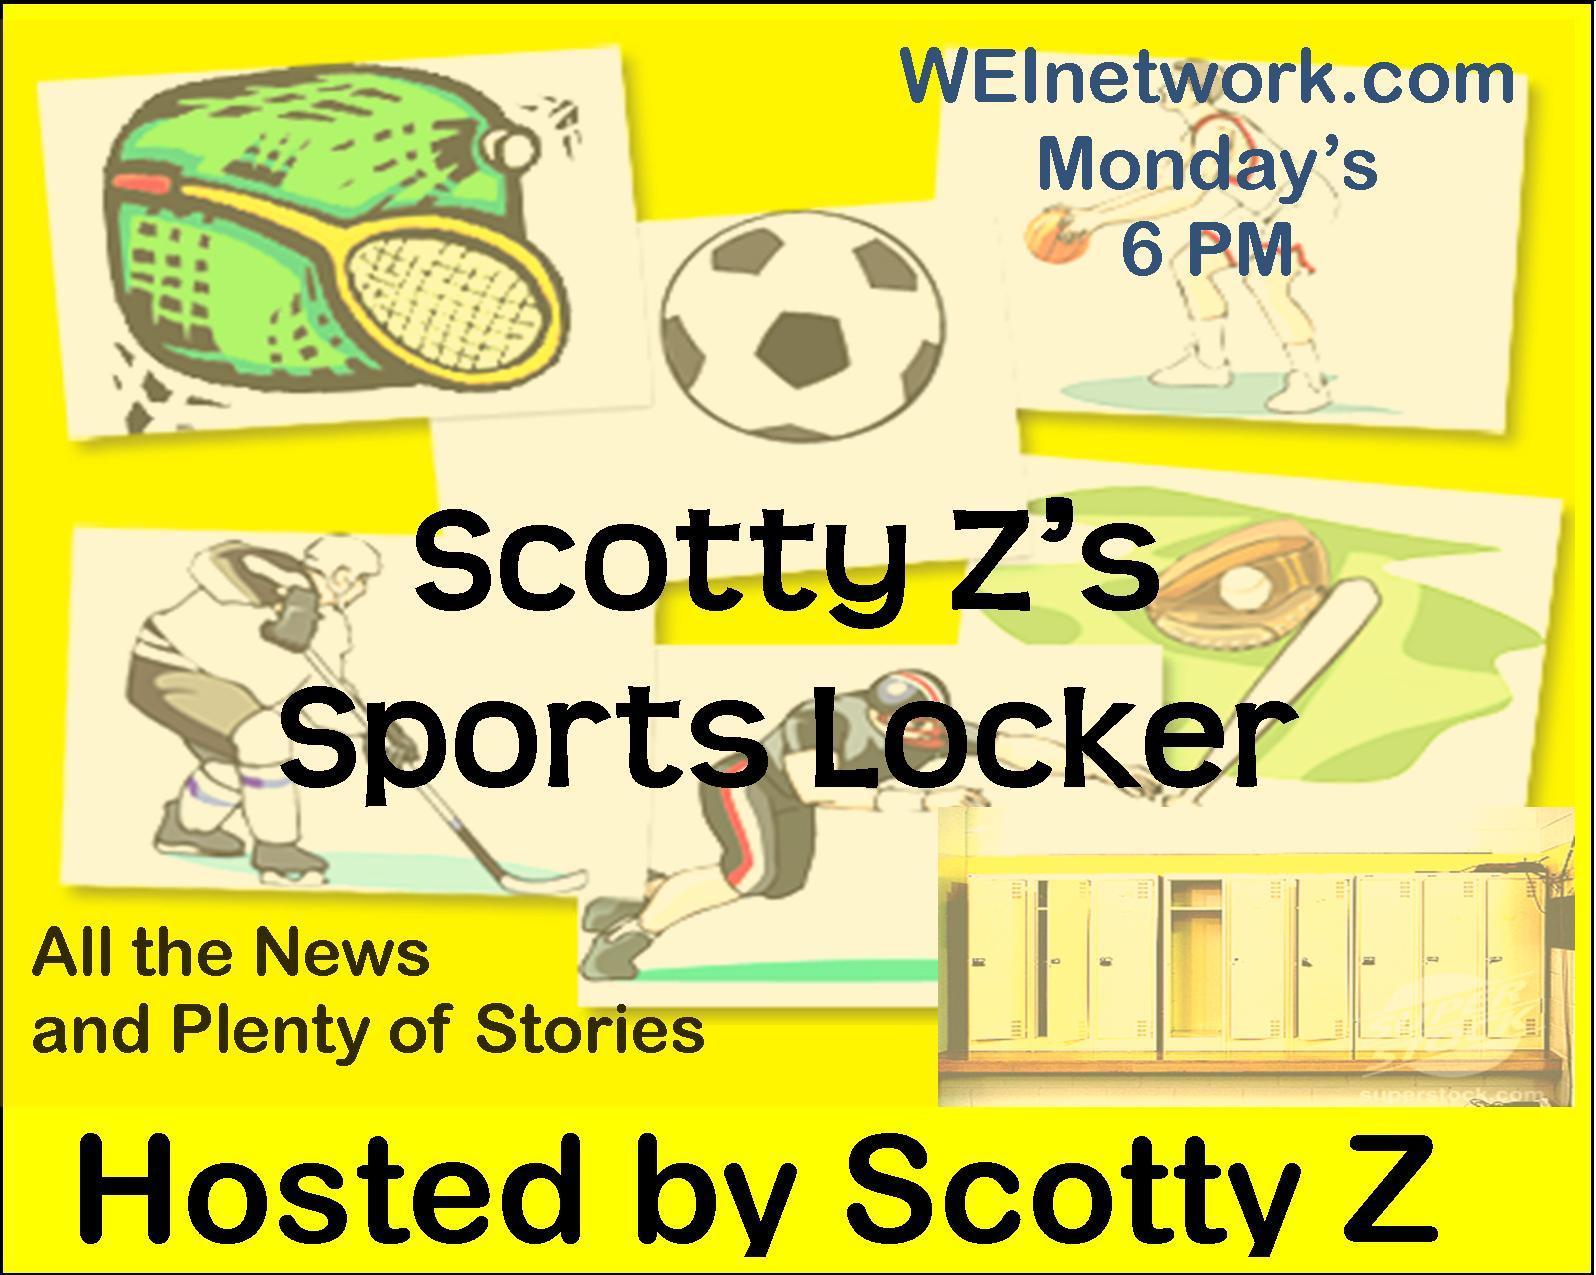 Scotty Z's Sports Locker